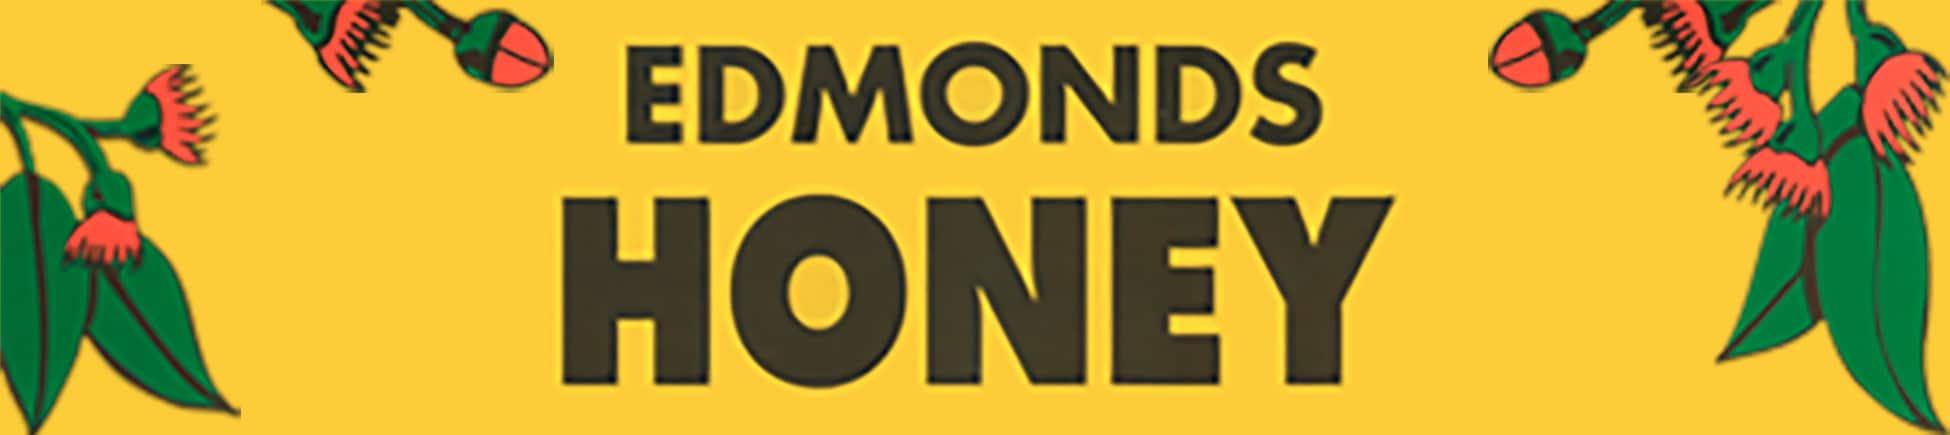 Edmonds Honey